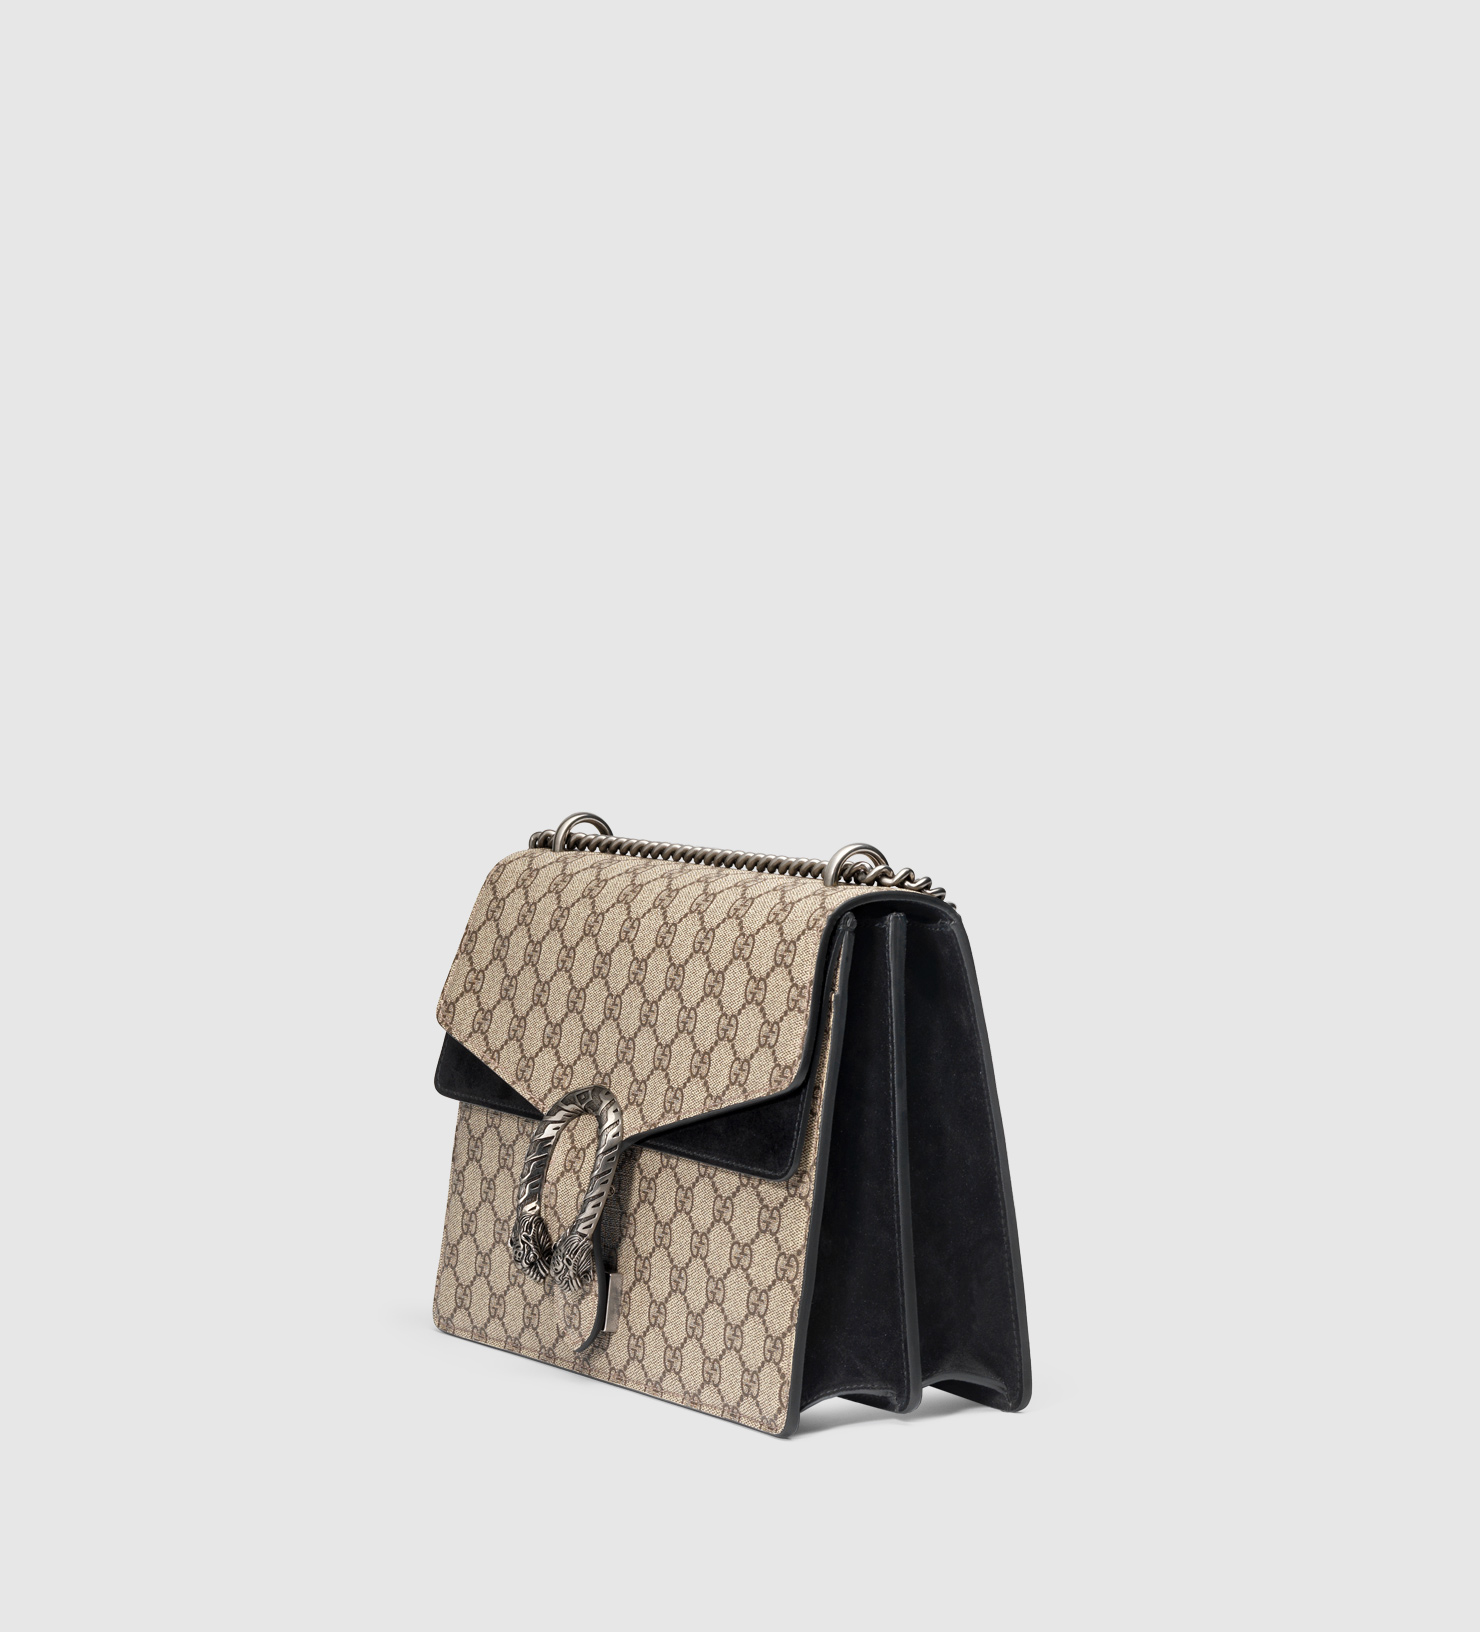 e50d2c0595 Lyst - Gucci Dionysus Gg Supreme Shoulder Bag in Natural